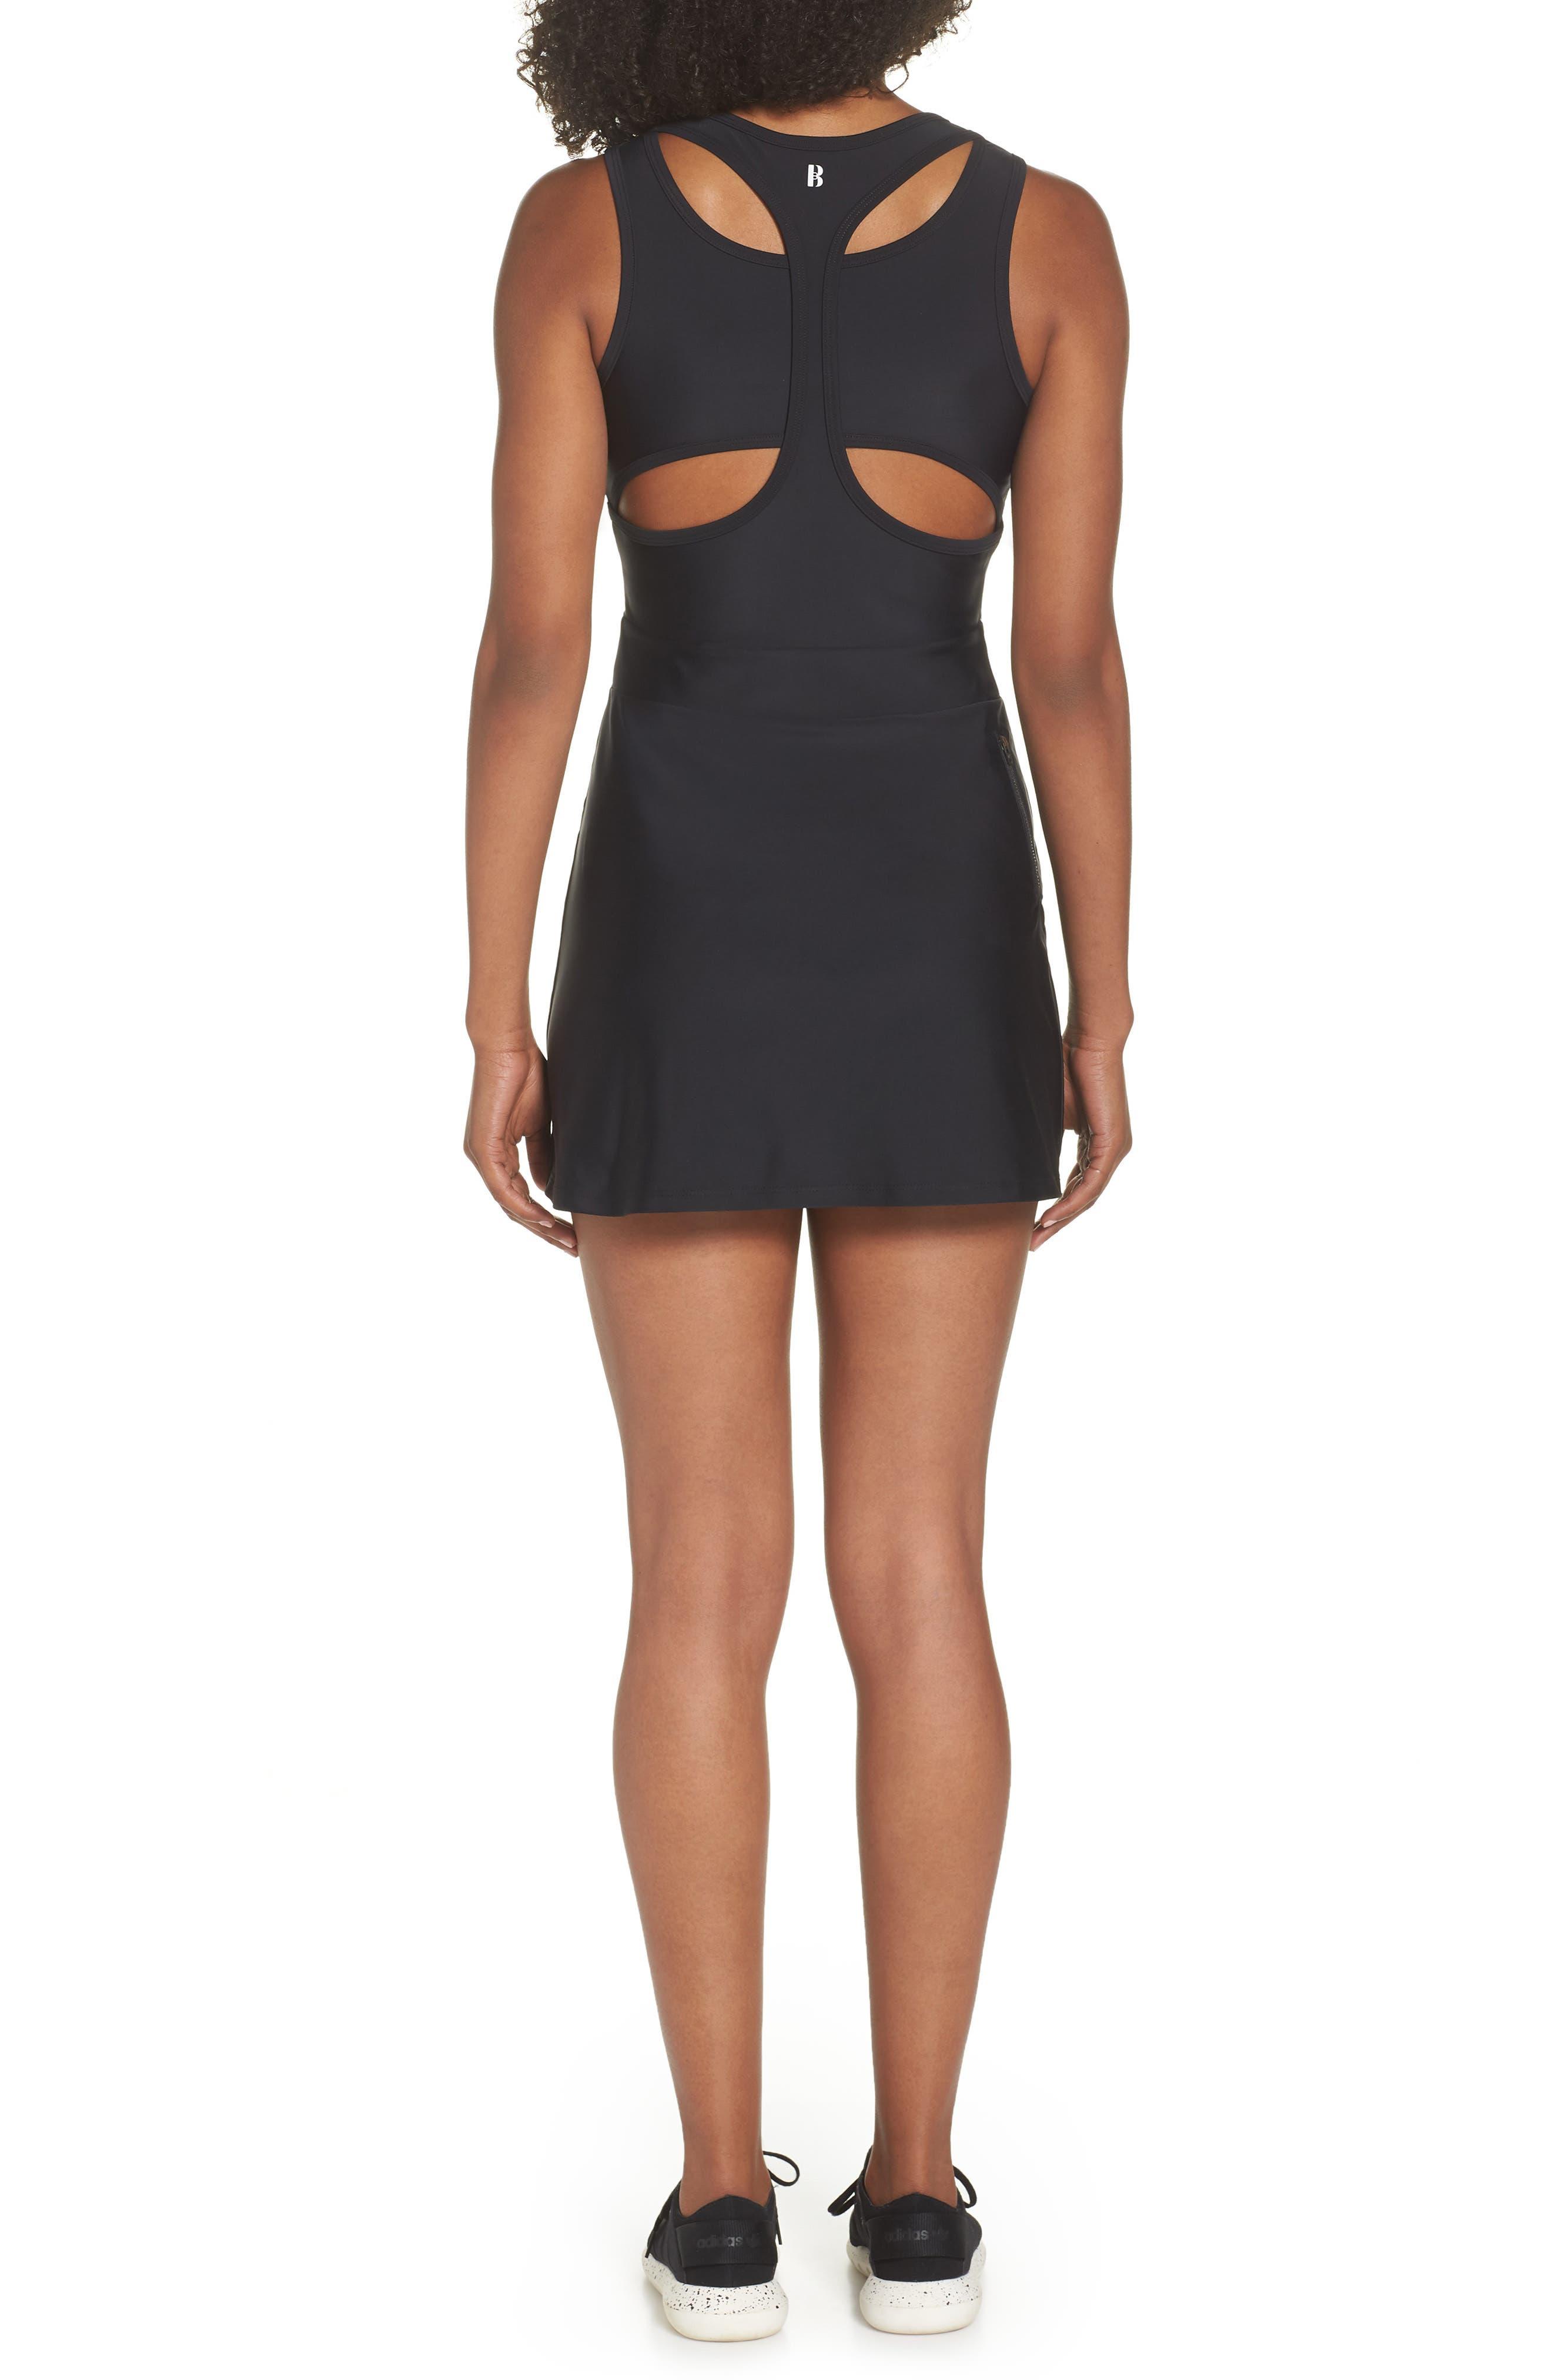 BoomBoom Athletica Tennis Dress,                             Alternate thumbnail 2, color,                             Black/ Navy